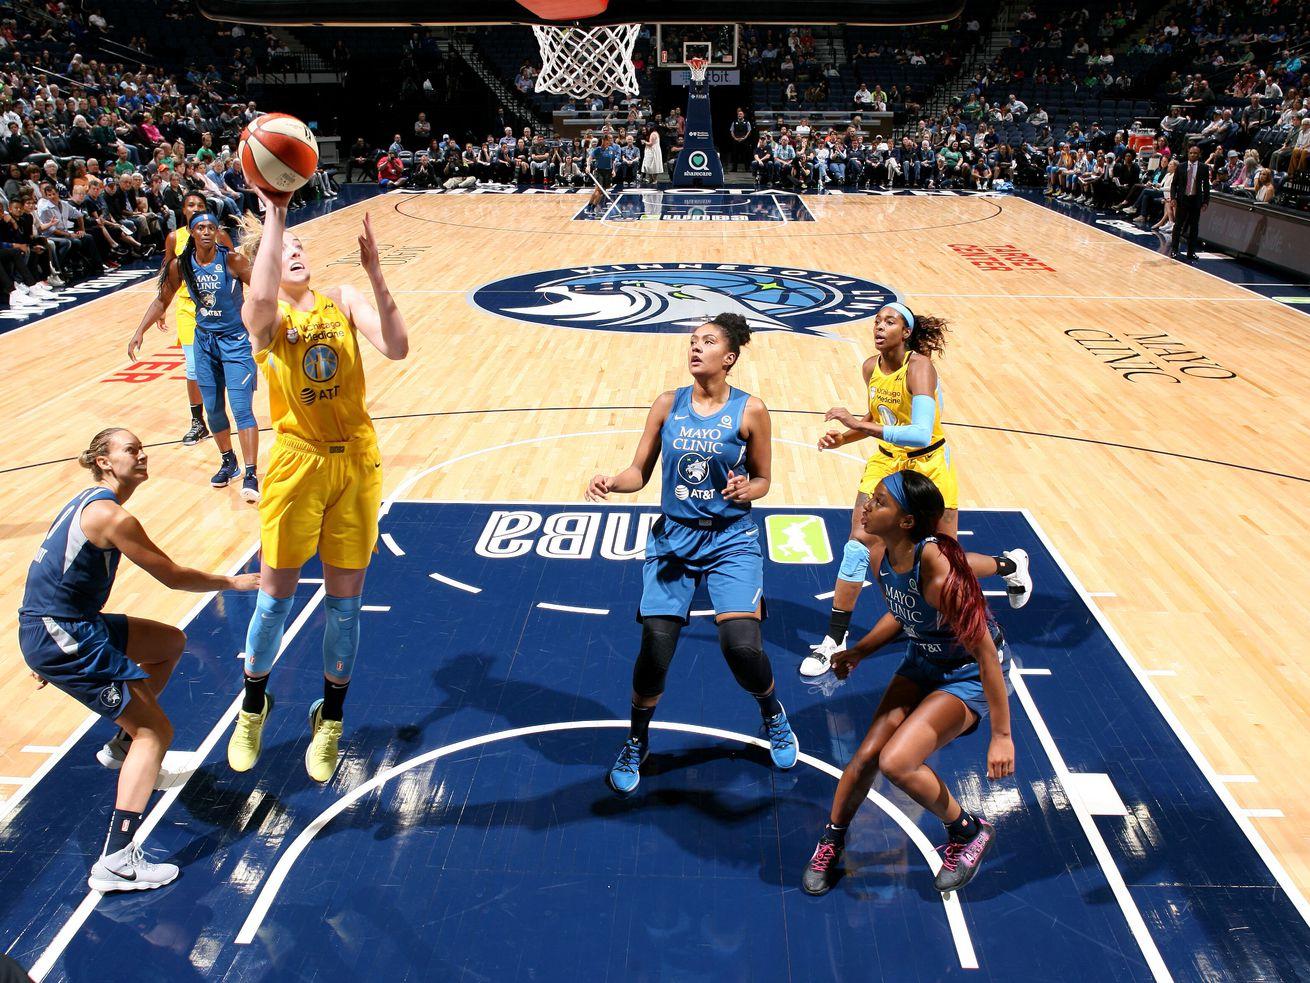 Open season on Sky as Lynx — led by pair of rookies — romp 89-71